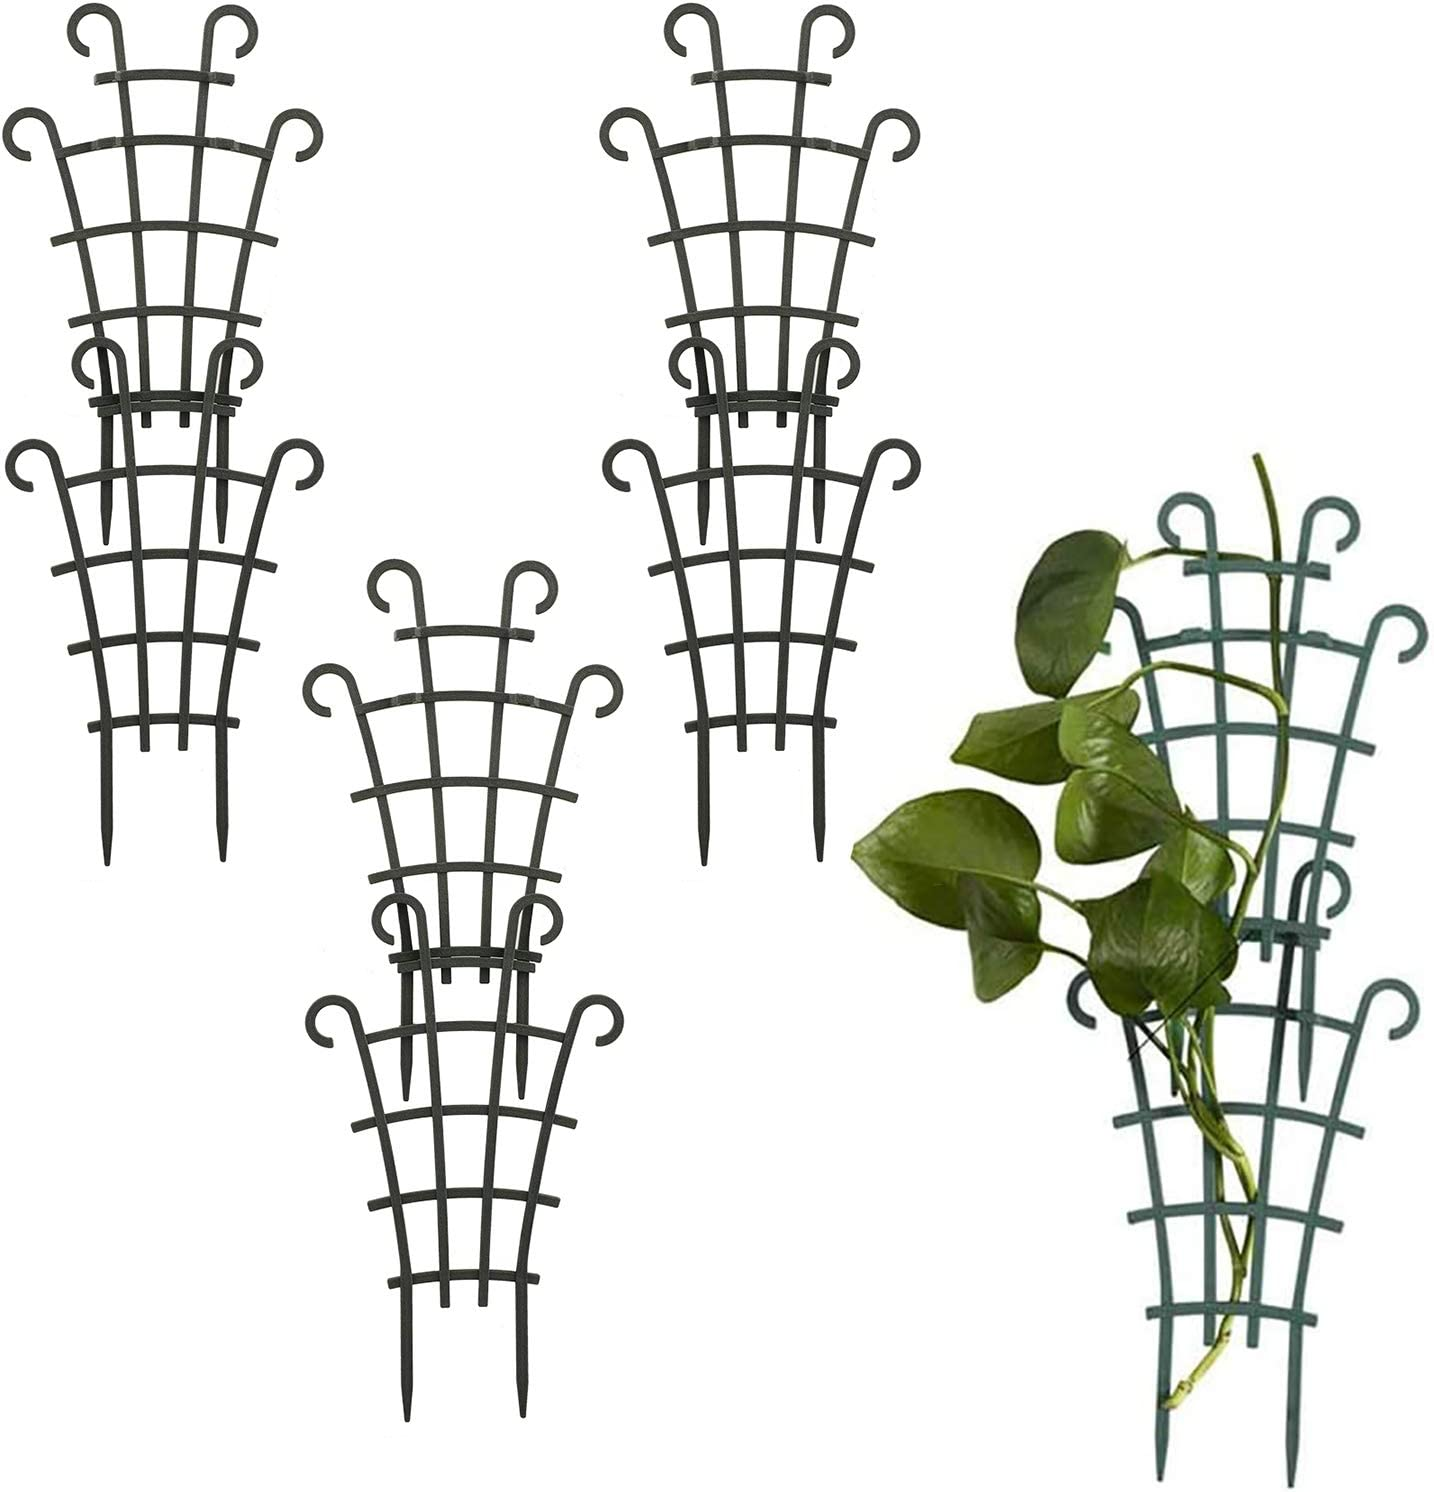 Develoo Mini Climbing Trellis, 6 Pcs Plastic Superimposed Potted Plant Support Rack Plant Climbing Trellis Garden Plant Stakes for Flower Vegetables Rose Vine Pea Ivy Cucumbers